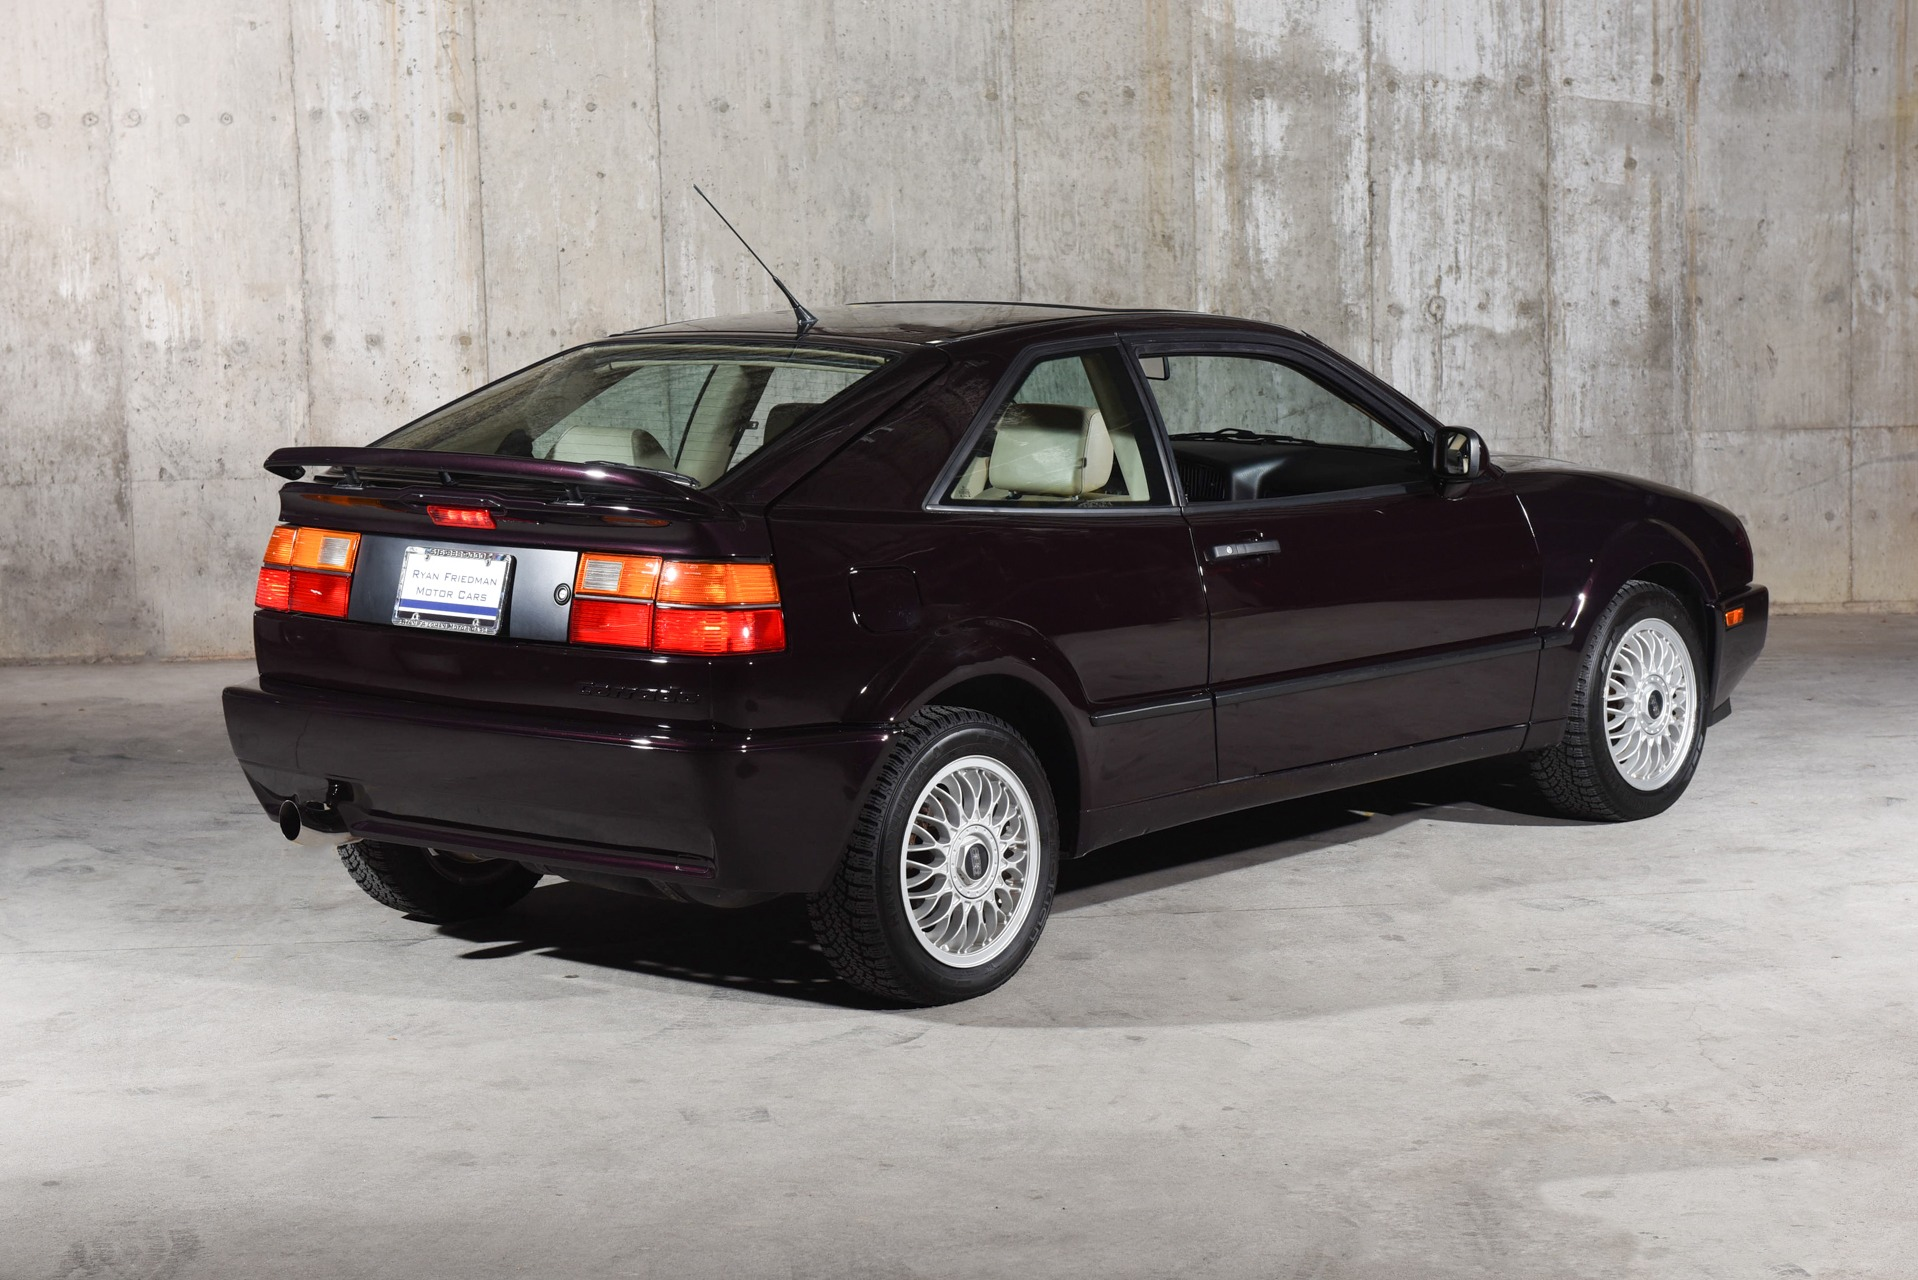 Get Pre Approved For A Car Loan >> 1992 Volkswagen Corrado SLC Stock # 176 for sale near Valley Stream, NY | NY Volkswagen Dealer